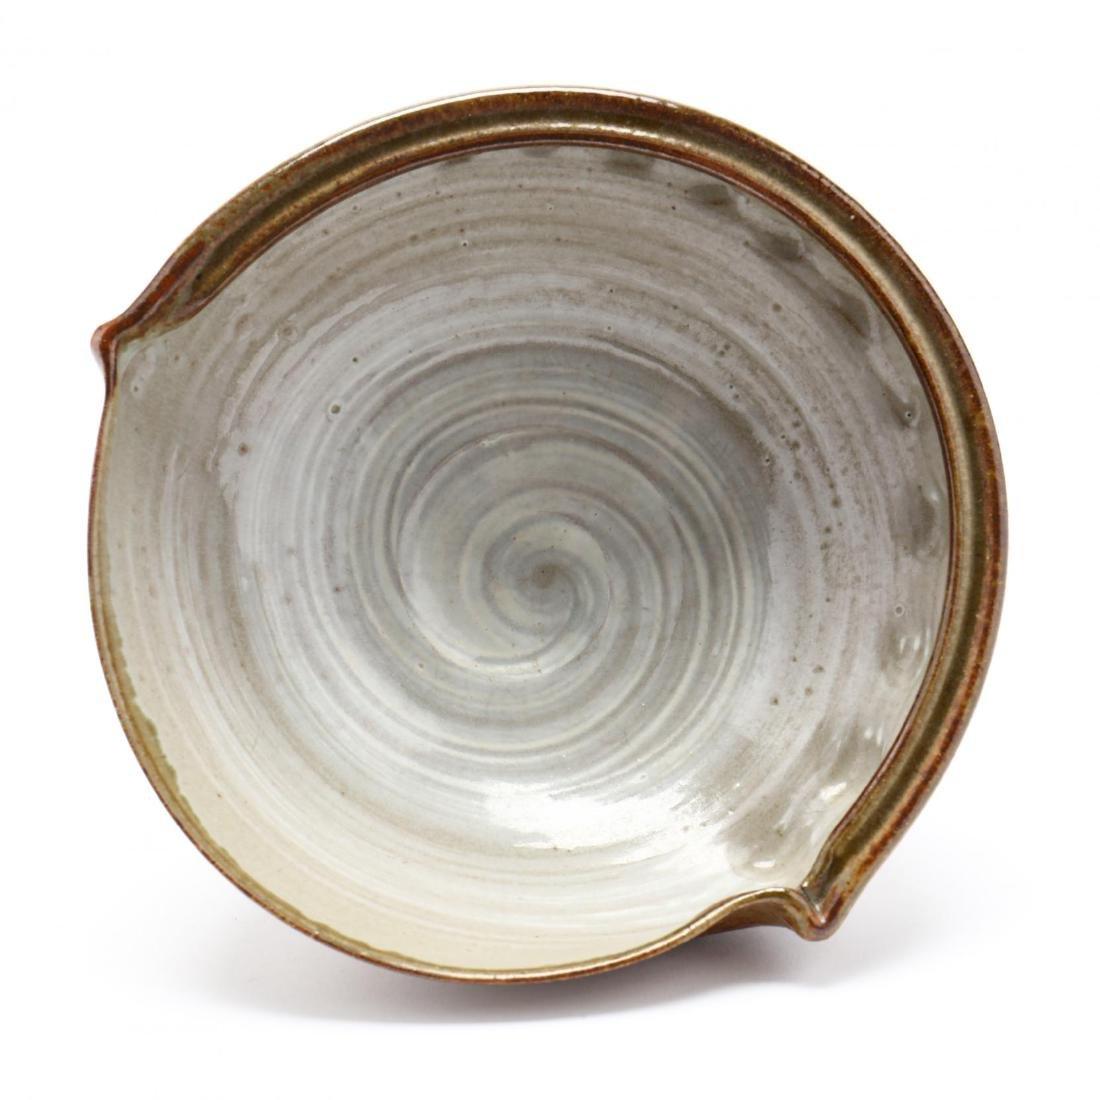 A Contemporary Japanese Ceramic Bowl by Ichino Shinsui